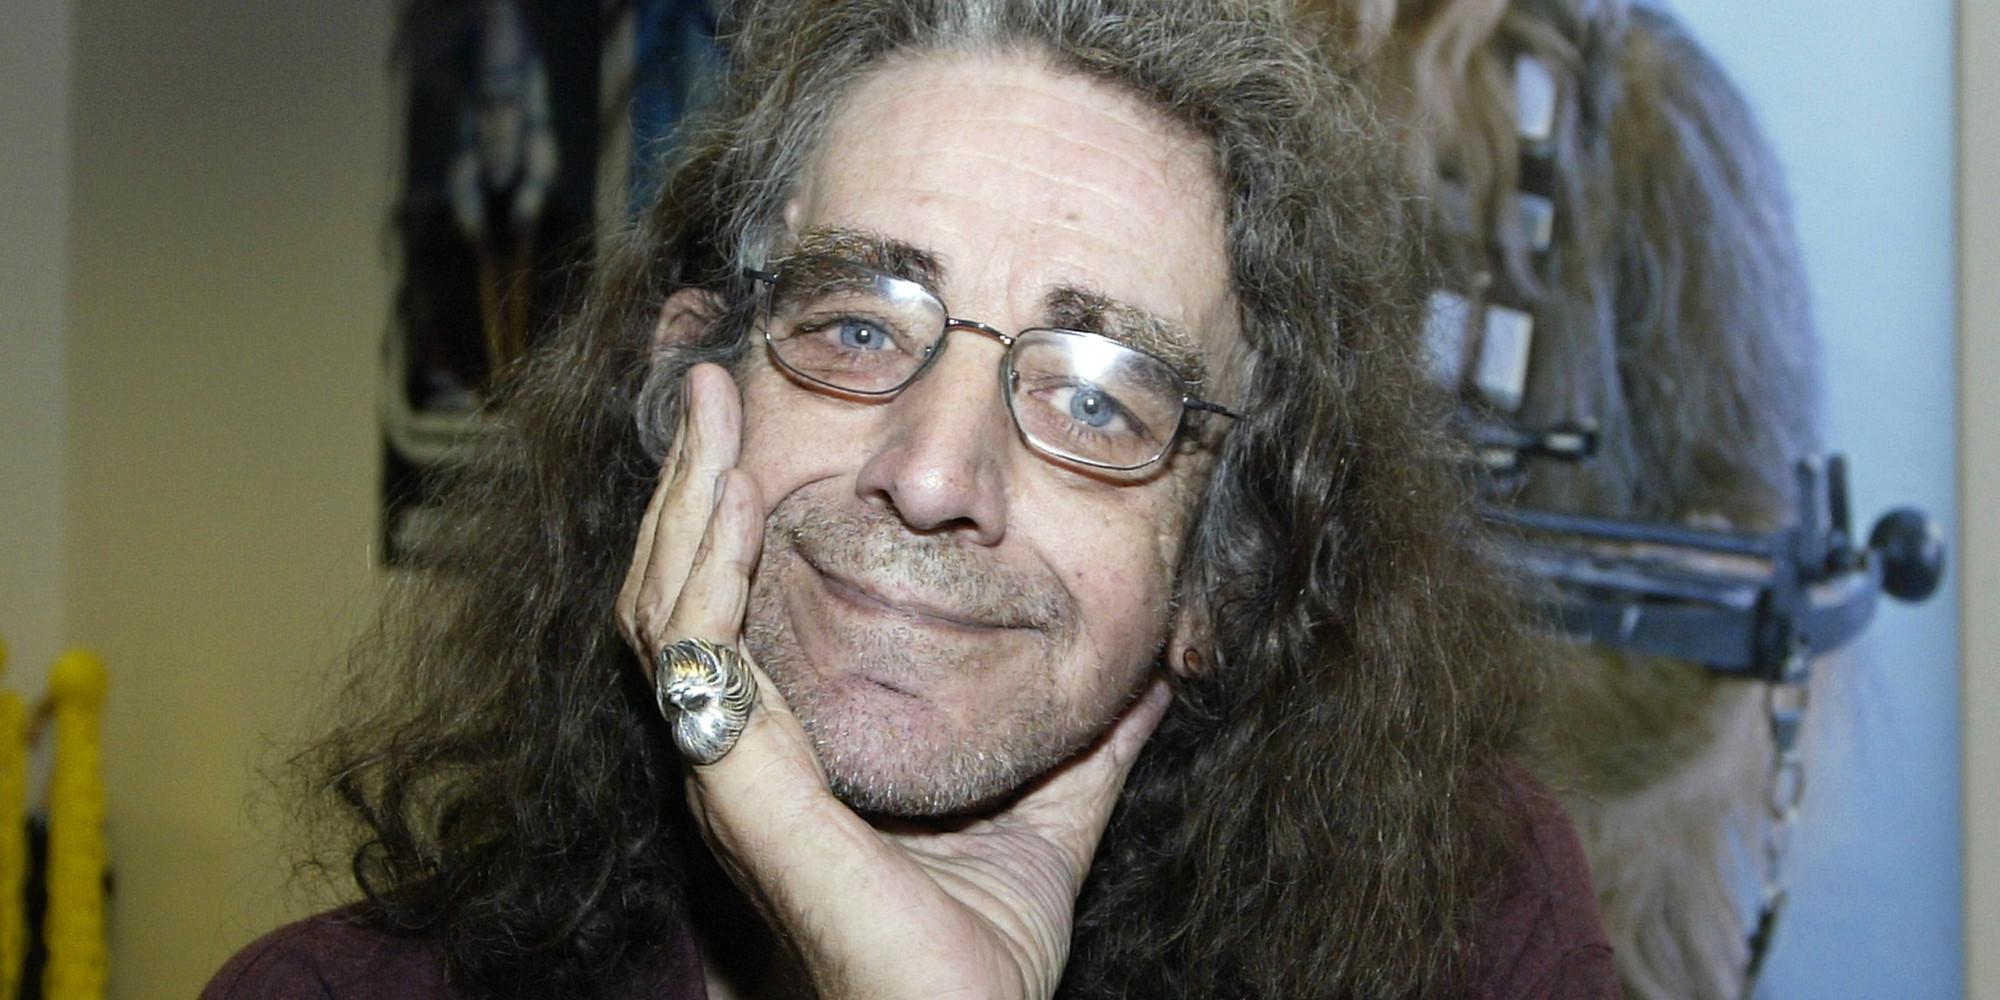 photo Peter Mayhew (born 1944)